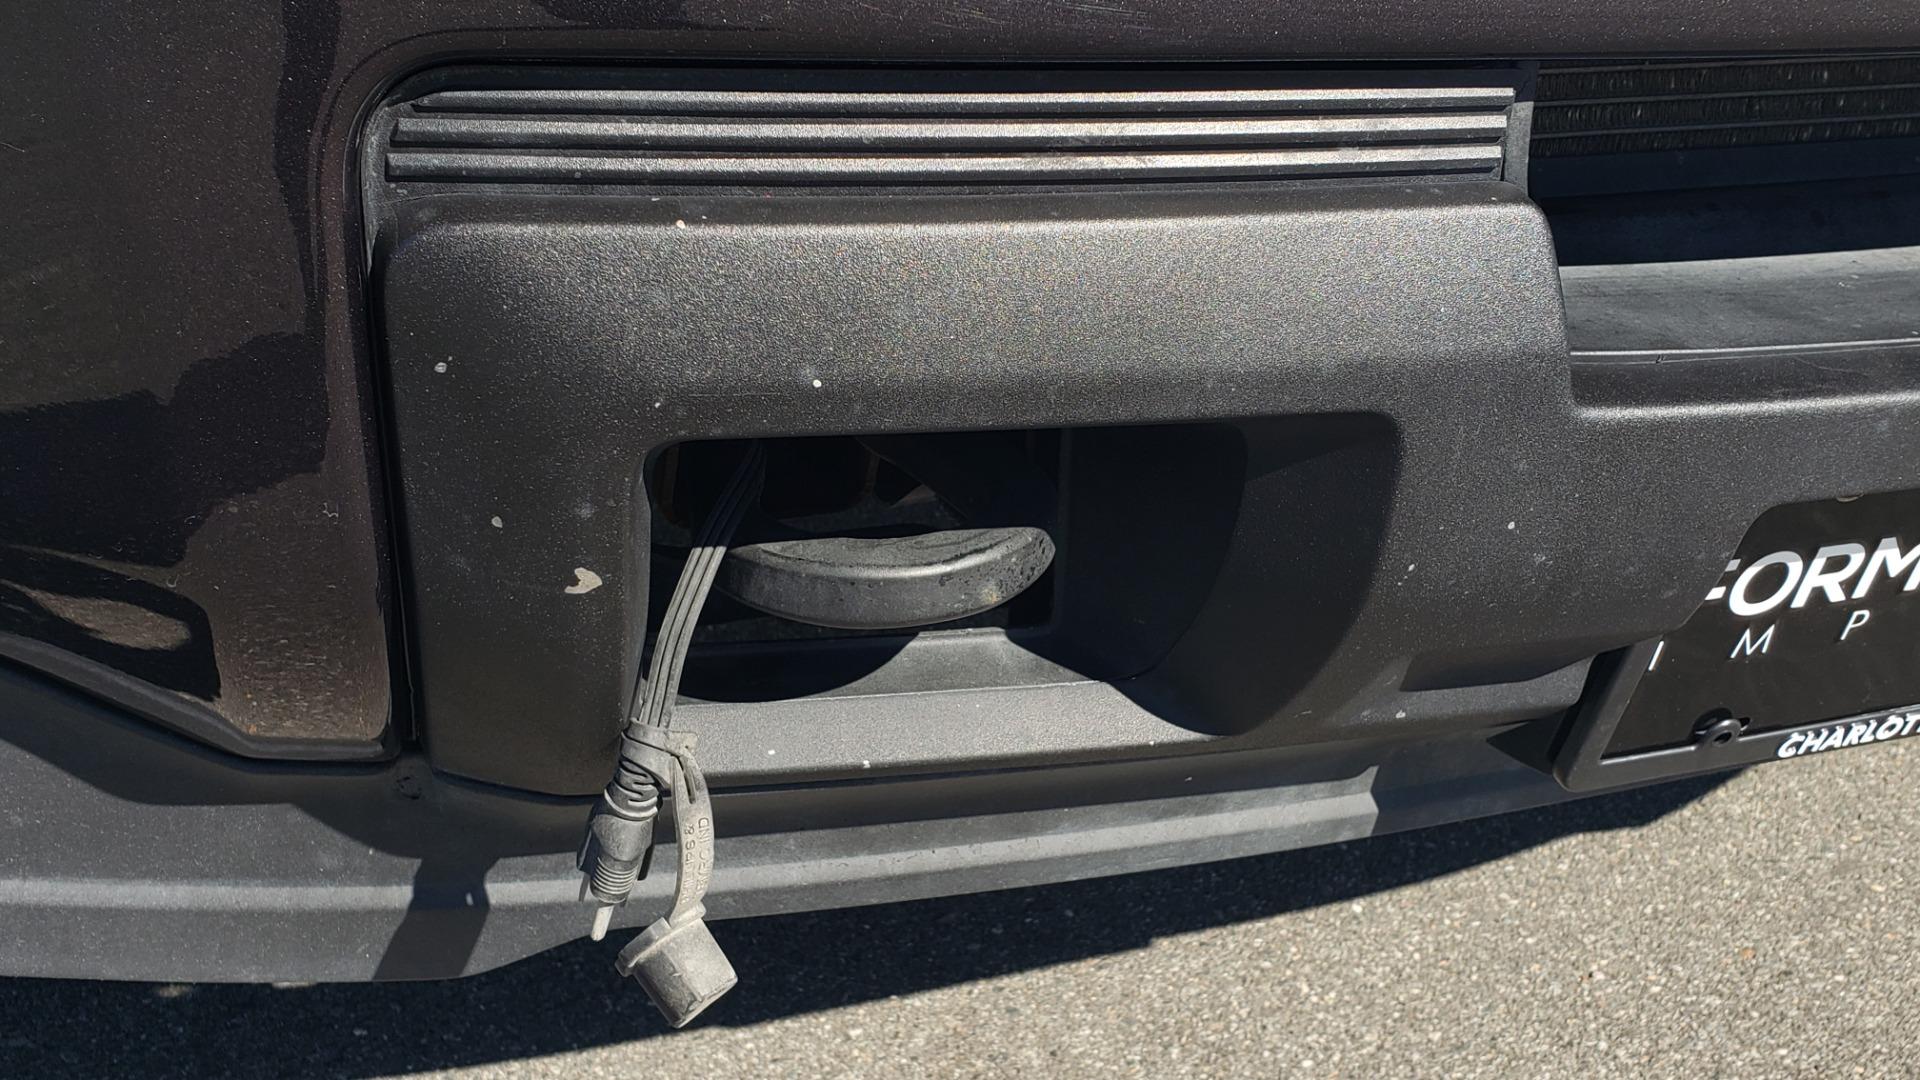 Used 2015 GMC SIERRA 2500HD DENALI 4WD CREWCAB / 6.6L DURAMAX / 6-SPD AUTO / NAV / BOSE for sale $50,995 at Formula Imports in Charlotte NC 28227 23